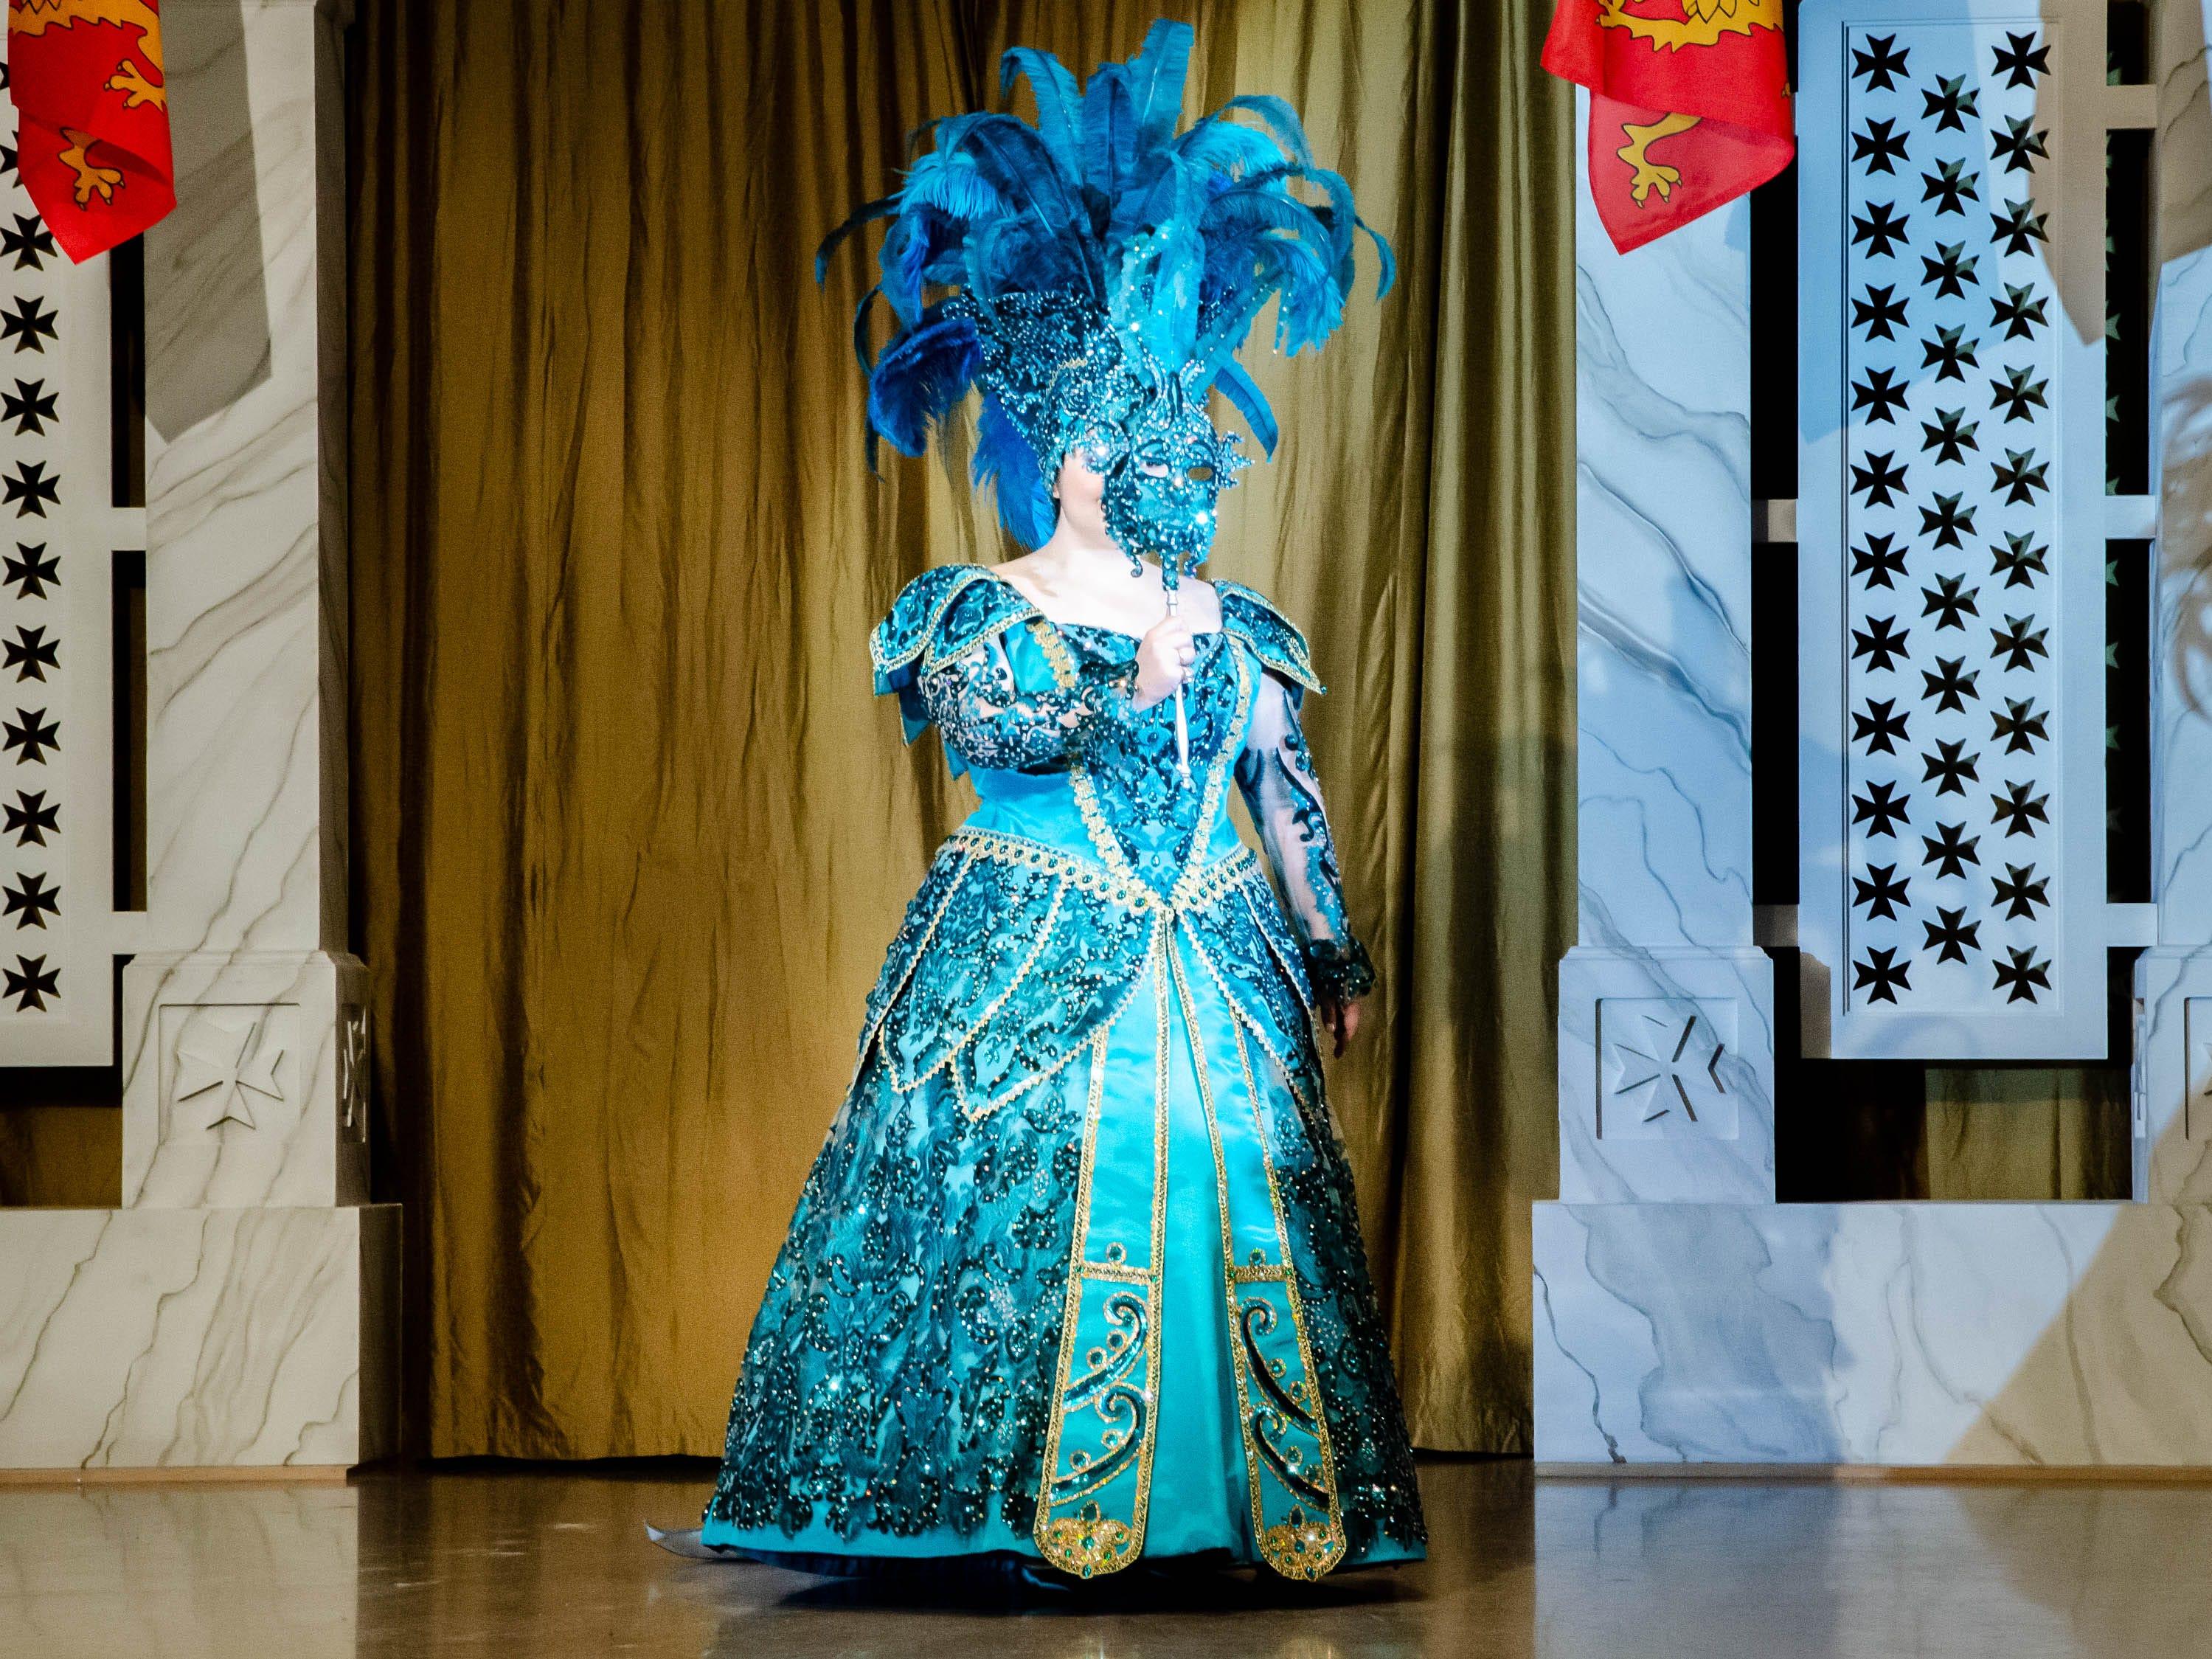 77th Annual Krew de Troubadours Mardi Gras Ball. Olivia Louise of the House of Falterman.